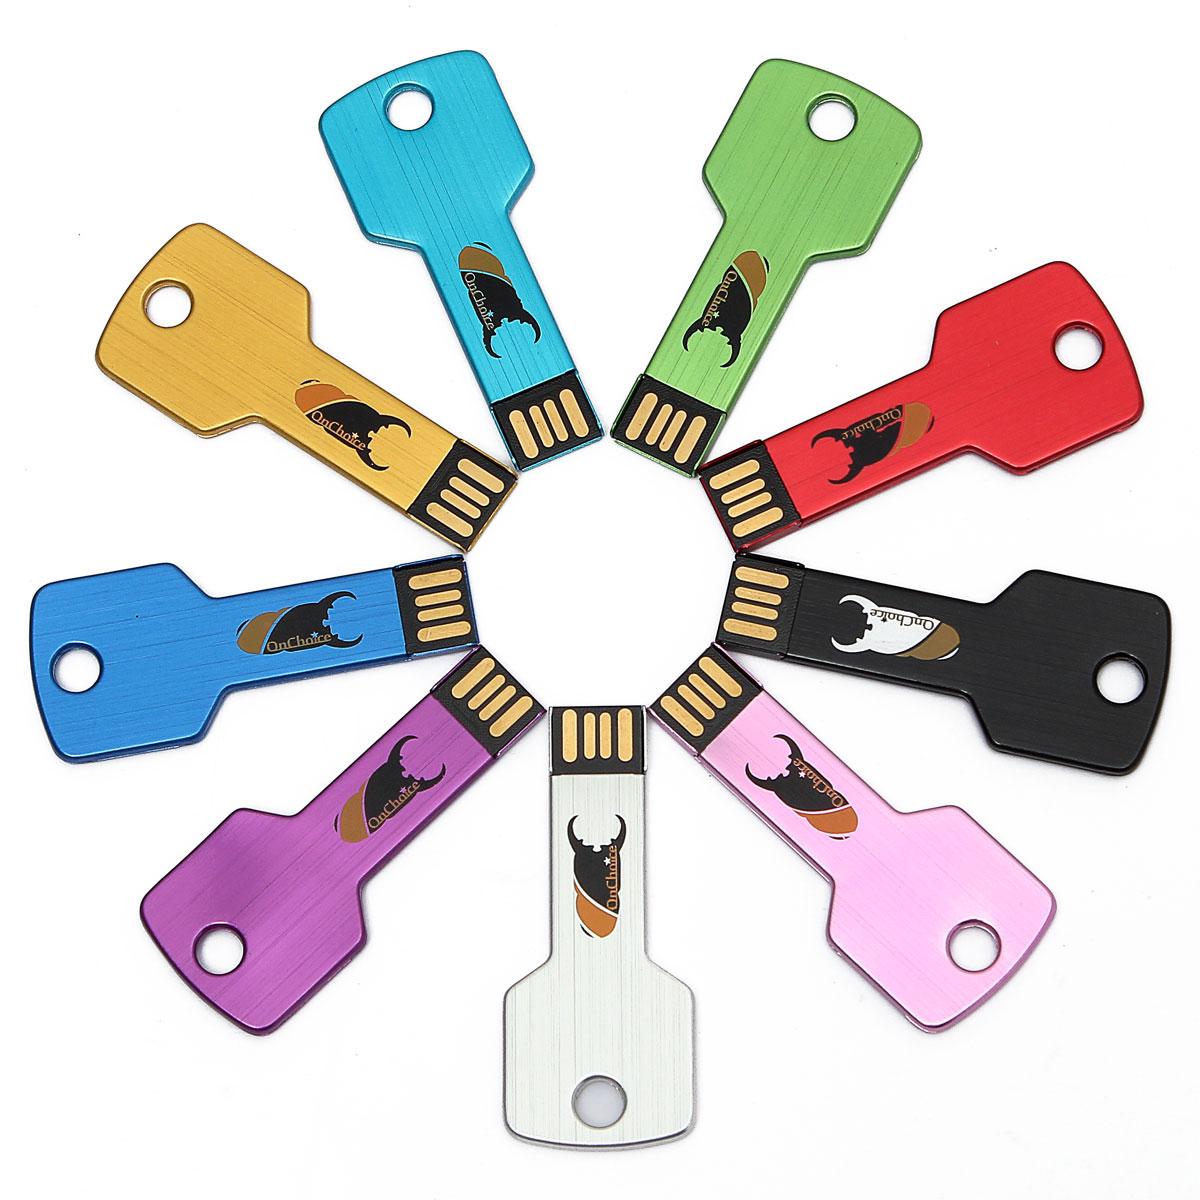 0nchoice 32GB USB 2.0 Waterproof Metal Key Flash Memory Stick Pen Drive Storage